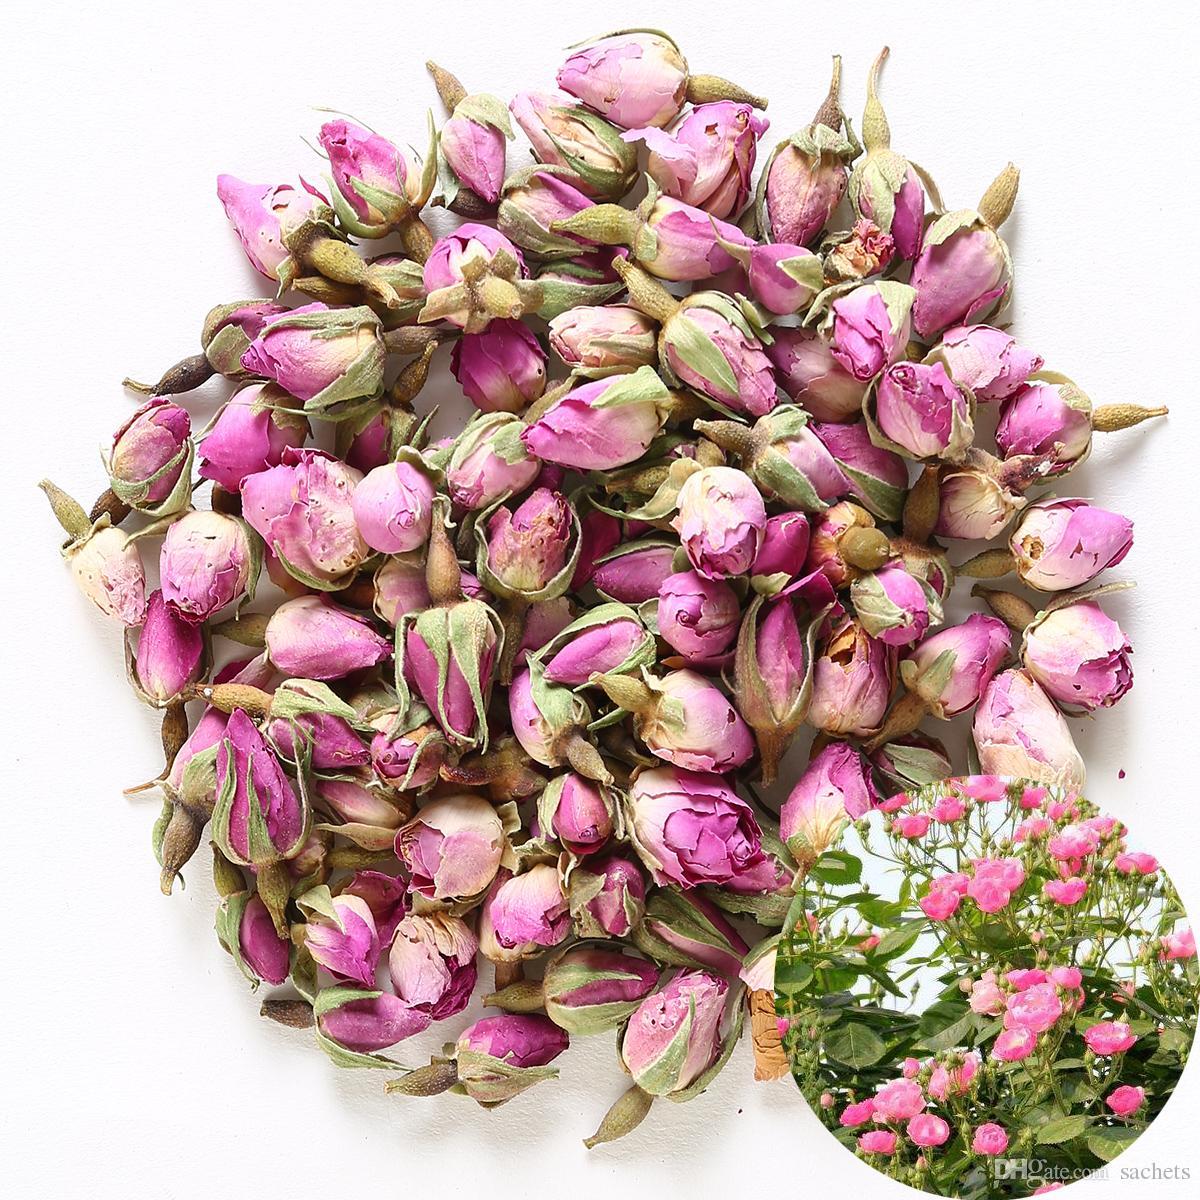 2018 Fragrant Natural Pink Rose Buds Rose Petals Organic Dried Rosa